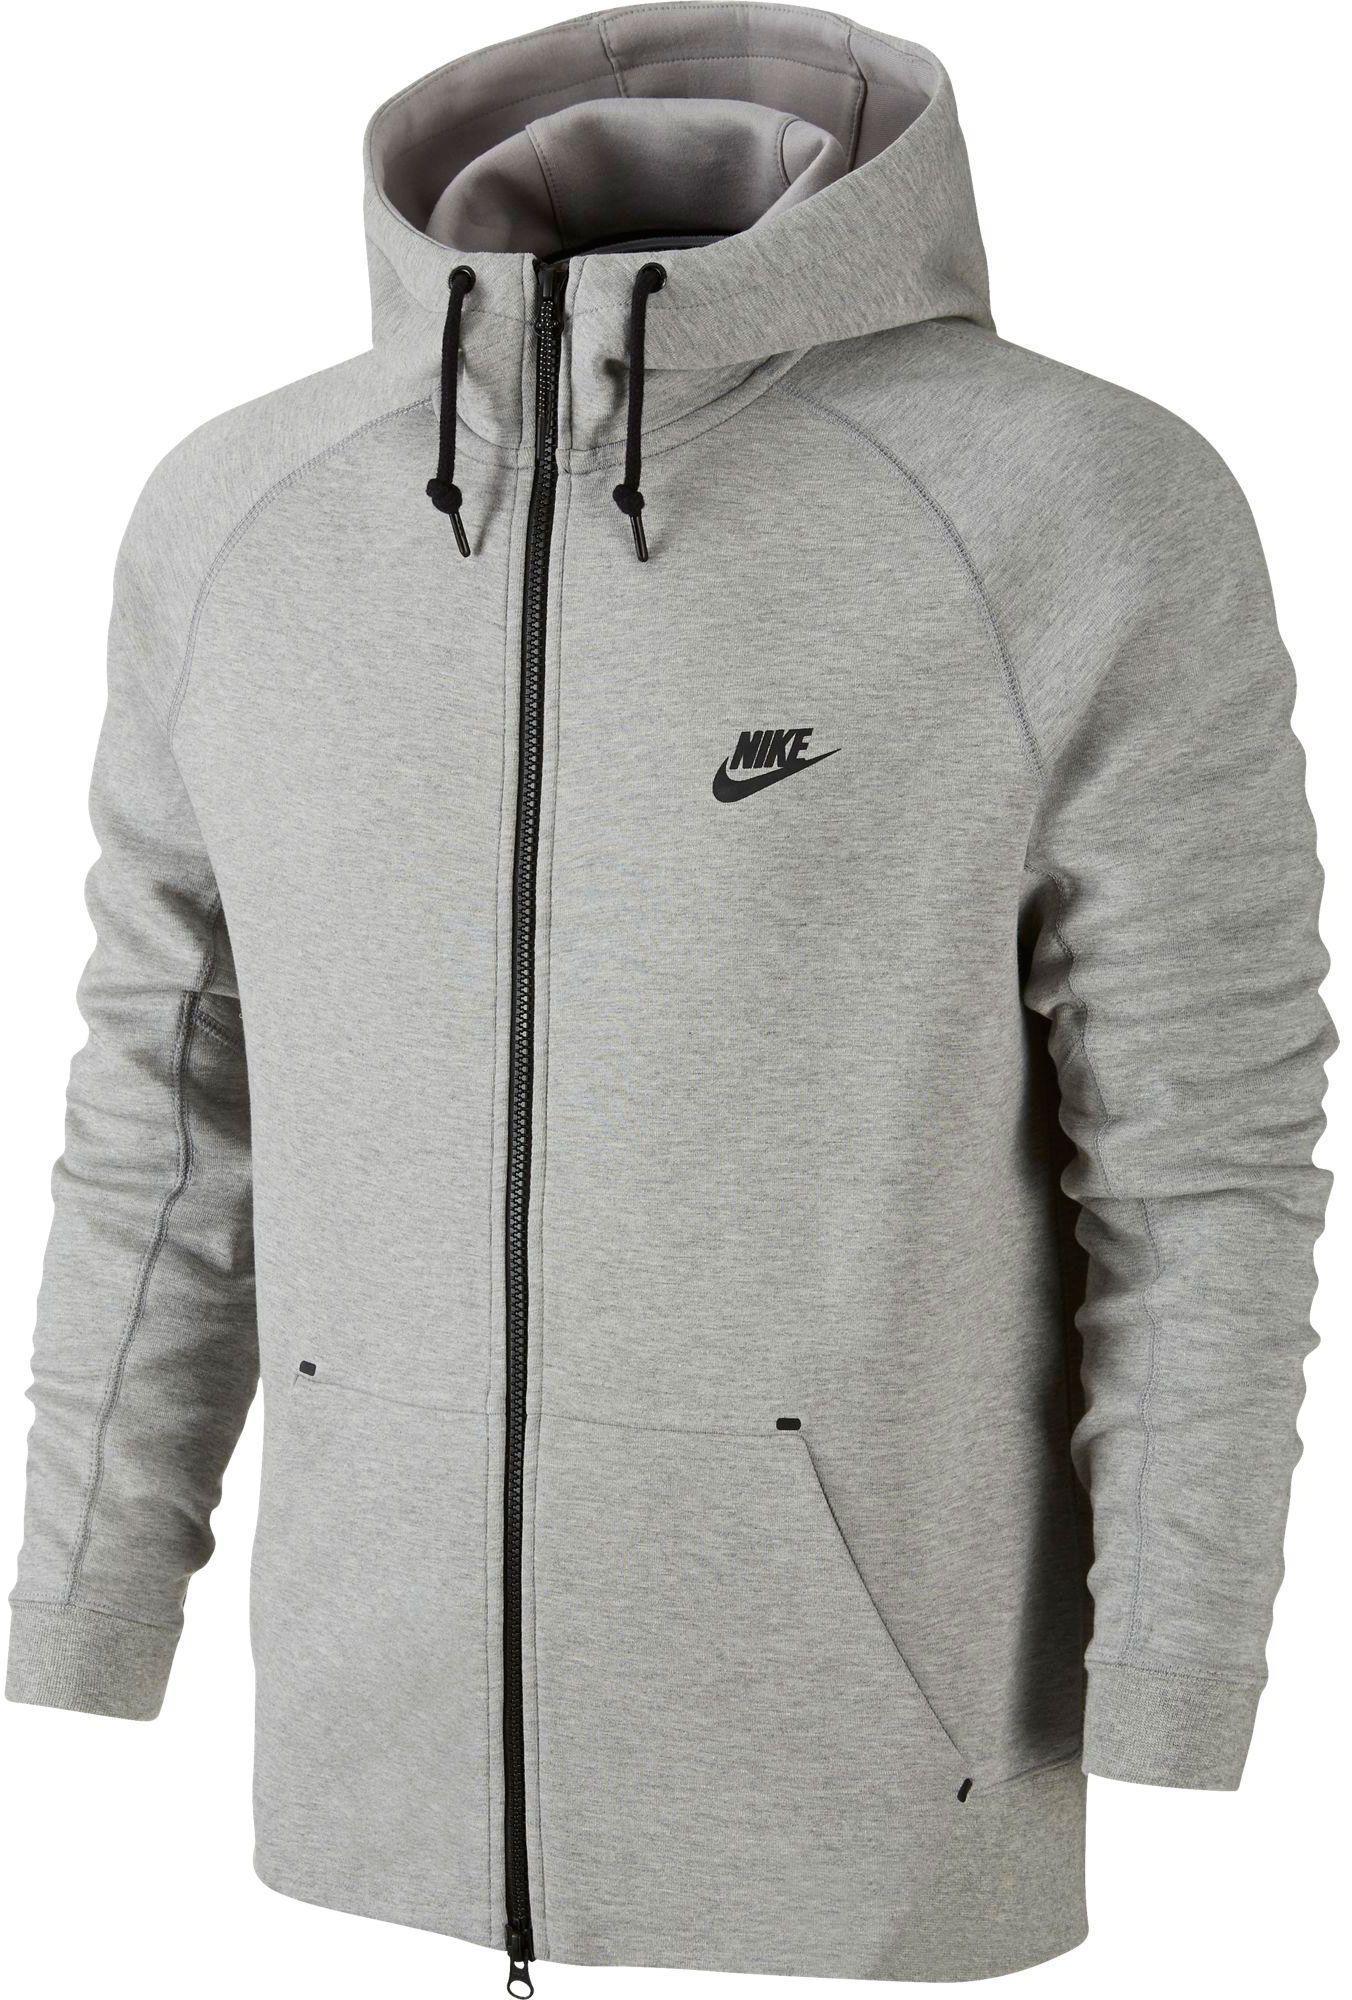 b3cb6789d00 Lyst - Nike Tech Fleece Aw77 Full Zip Hoodie in Gray for Men